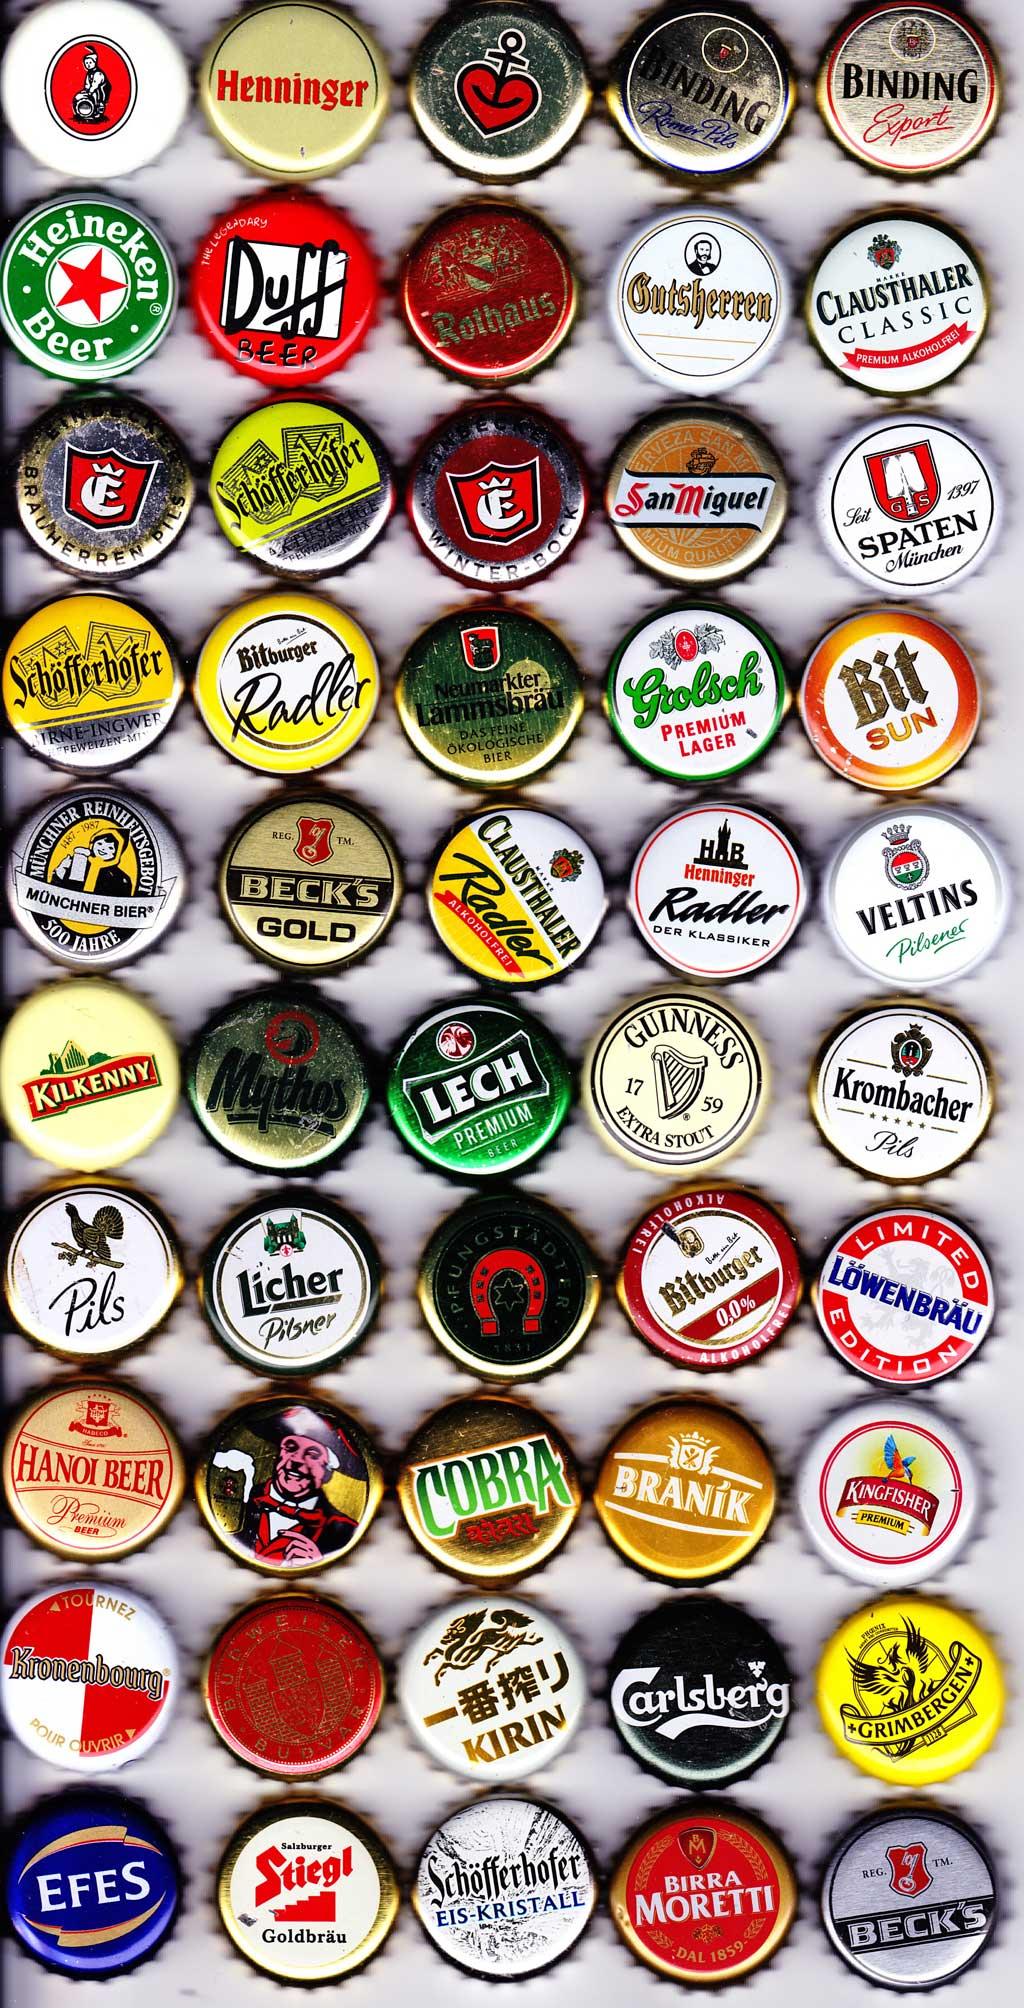 Foto mit 50 Bier-Kronkorken